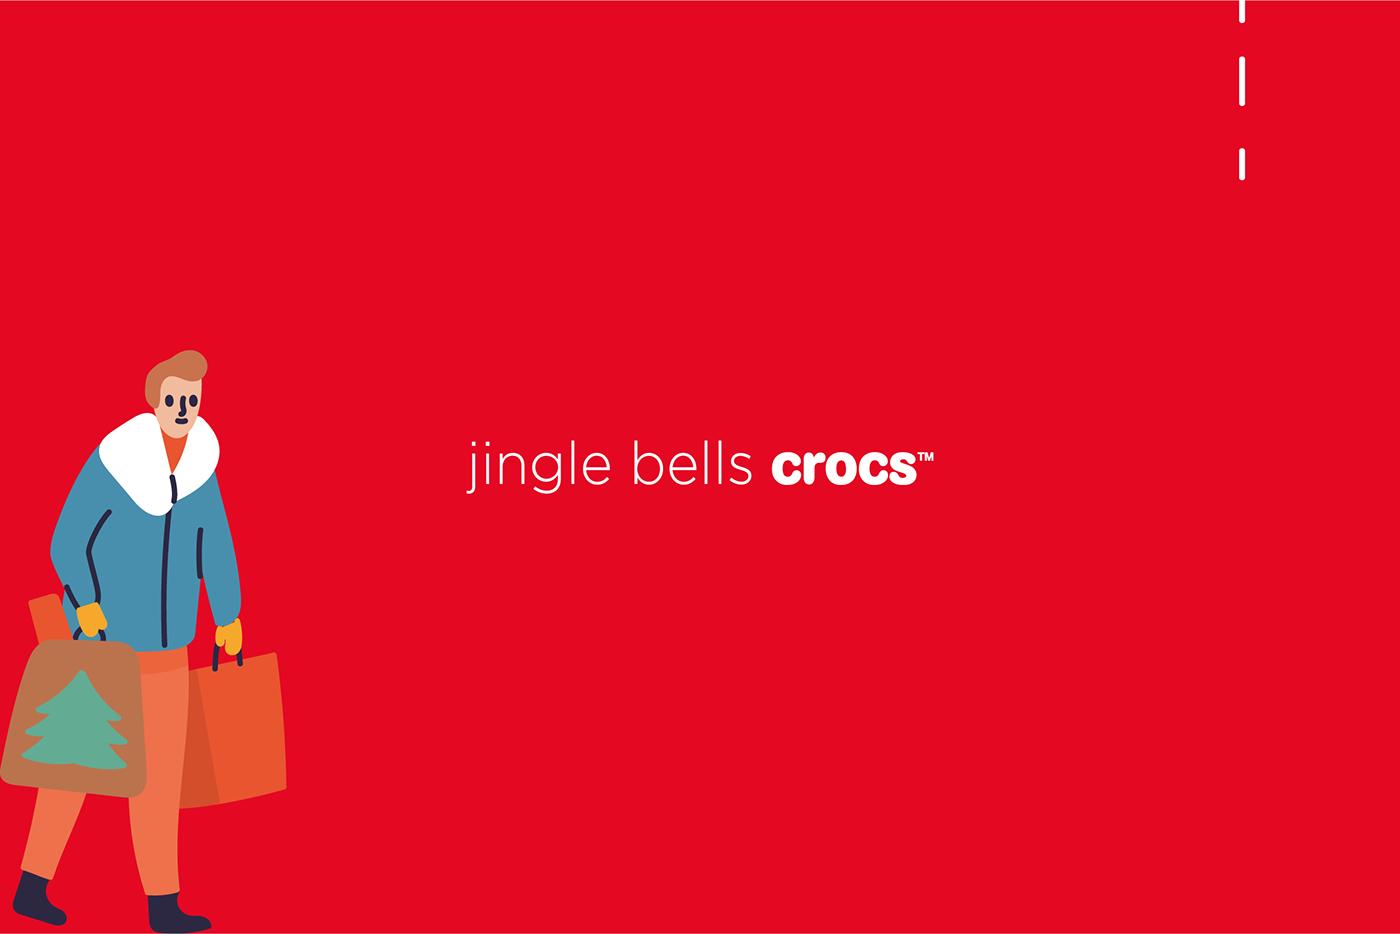 brand slogan Christmas Nike adidas levis graphic design creative ideas